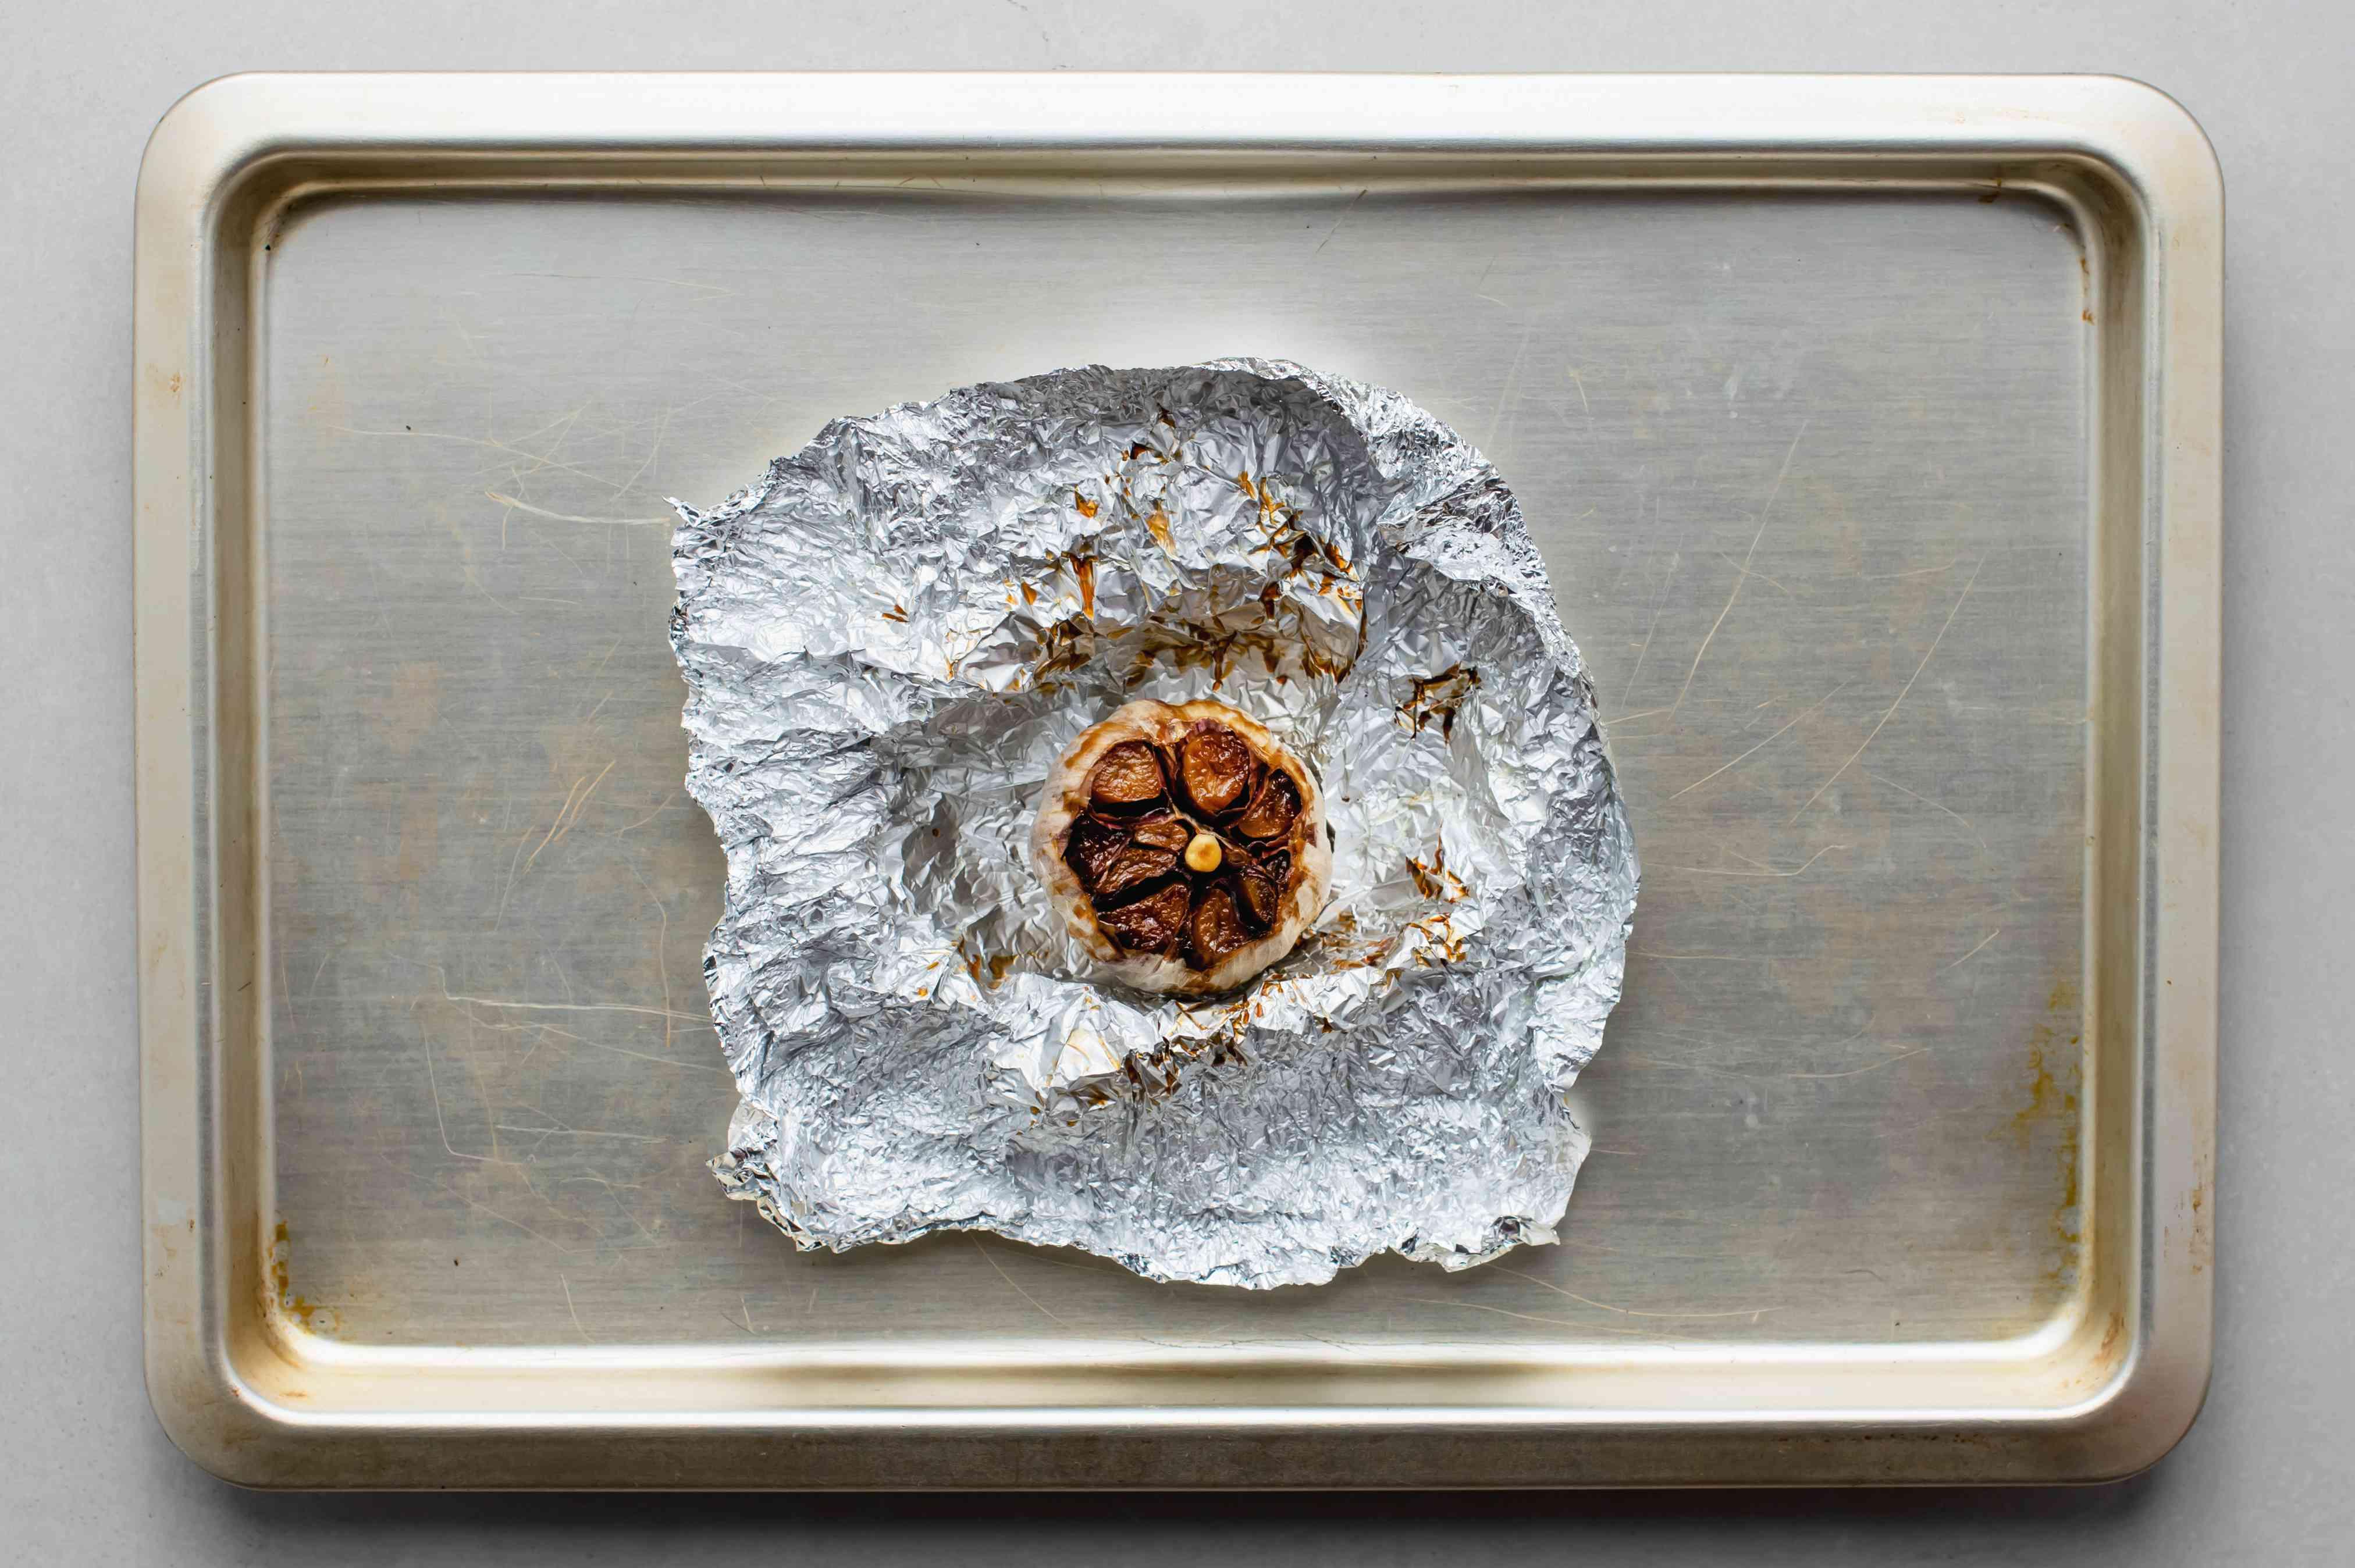 Roasted garlic cooling on a baking sheet